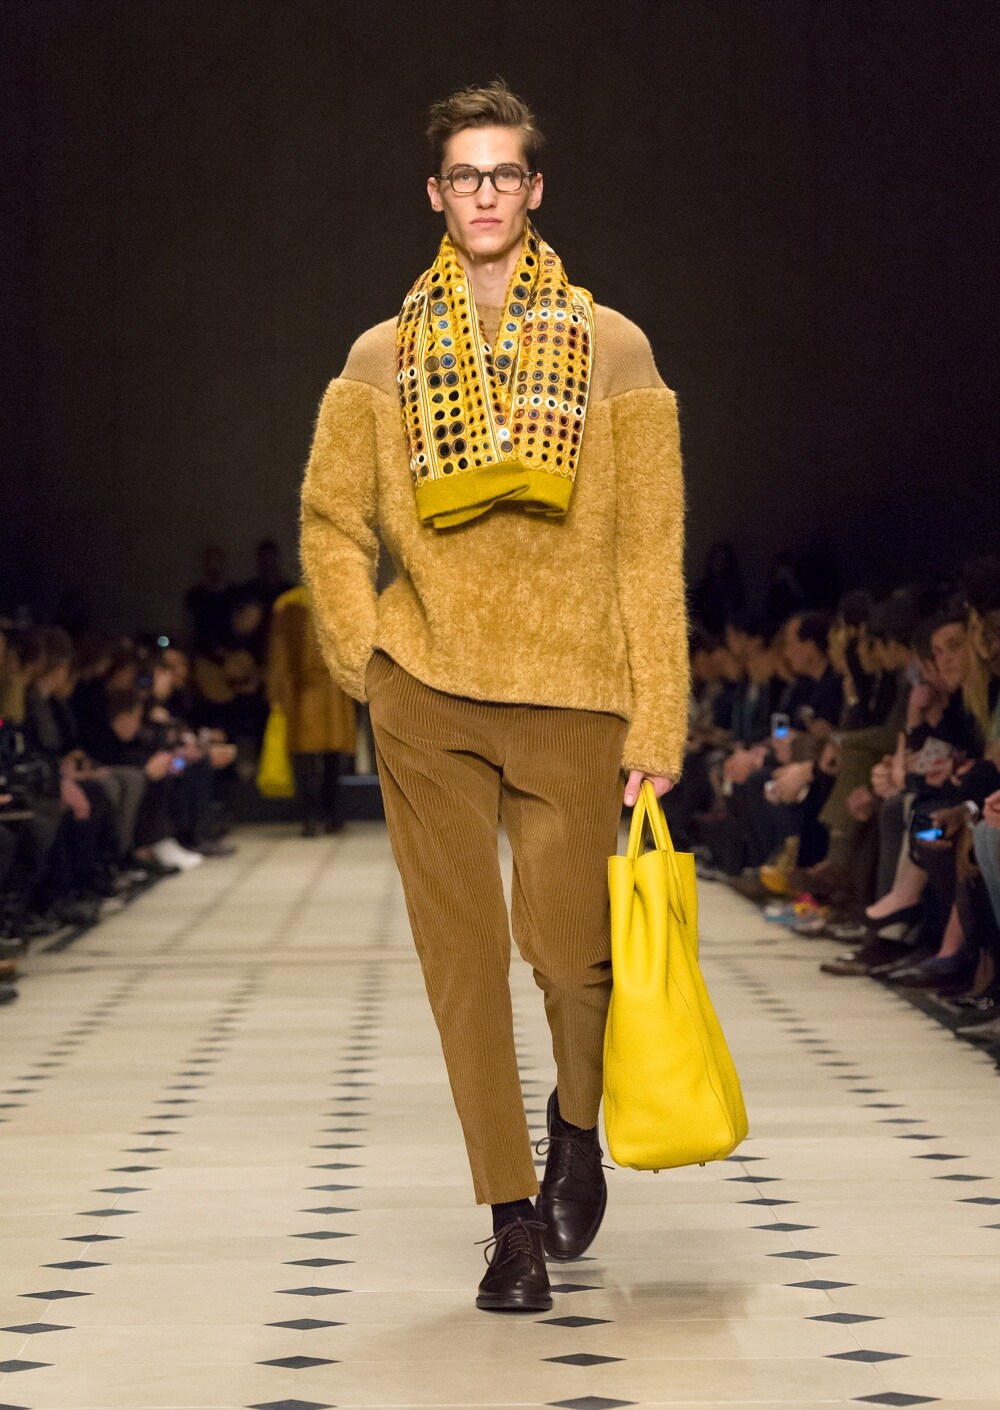 Burberry Prorsum Menswear Autumn_Winter 2015 Collection - Look 40